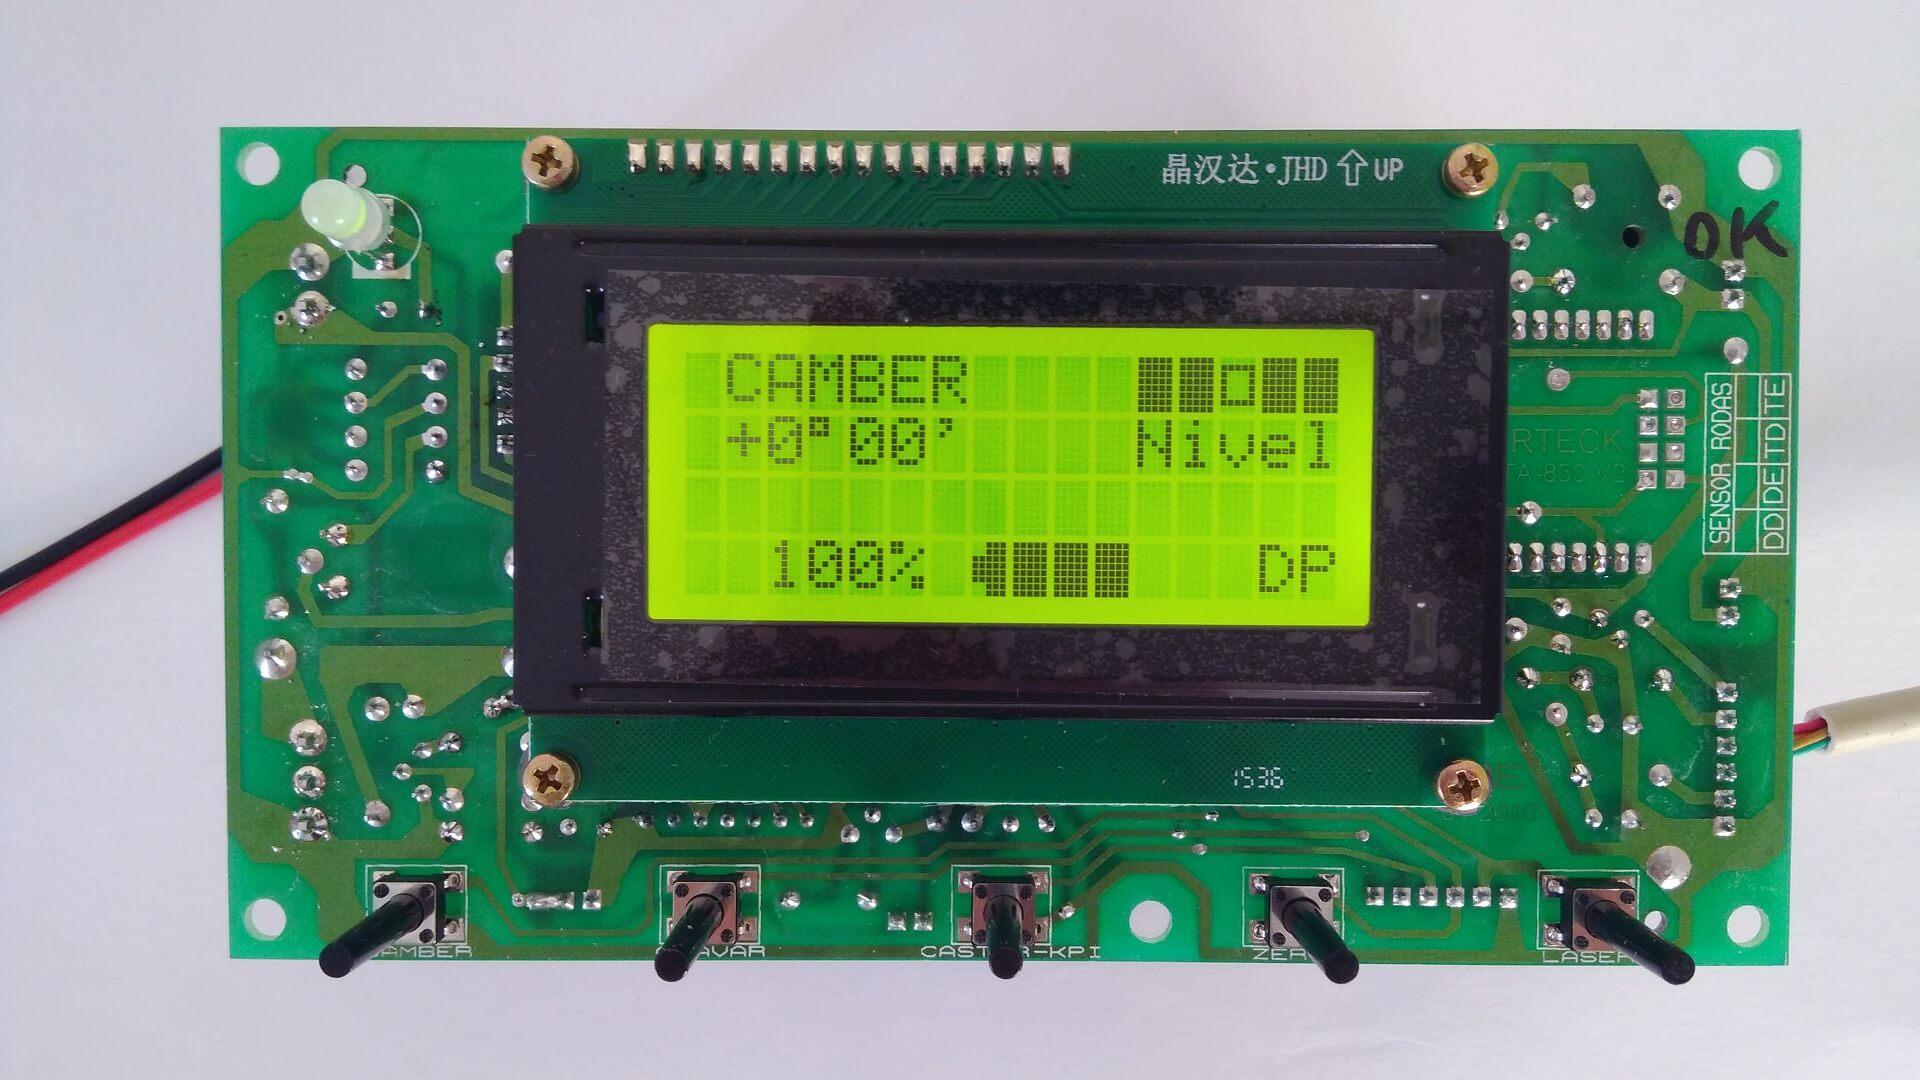 Kit-Alinhador Computadorizado/Wifi LTA 850-2